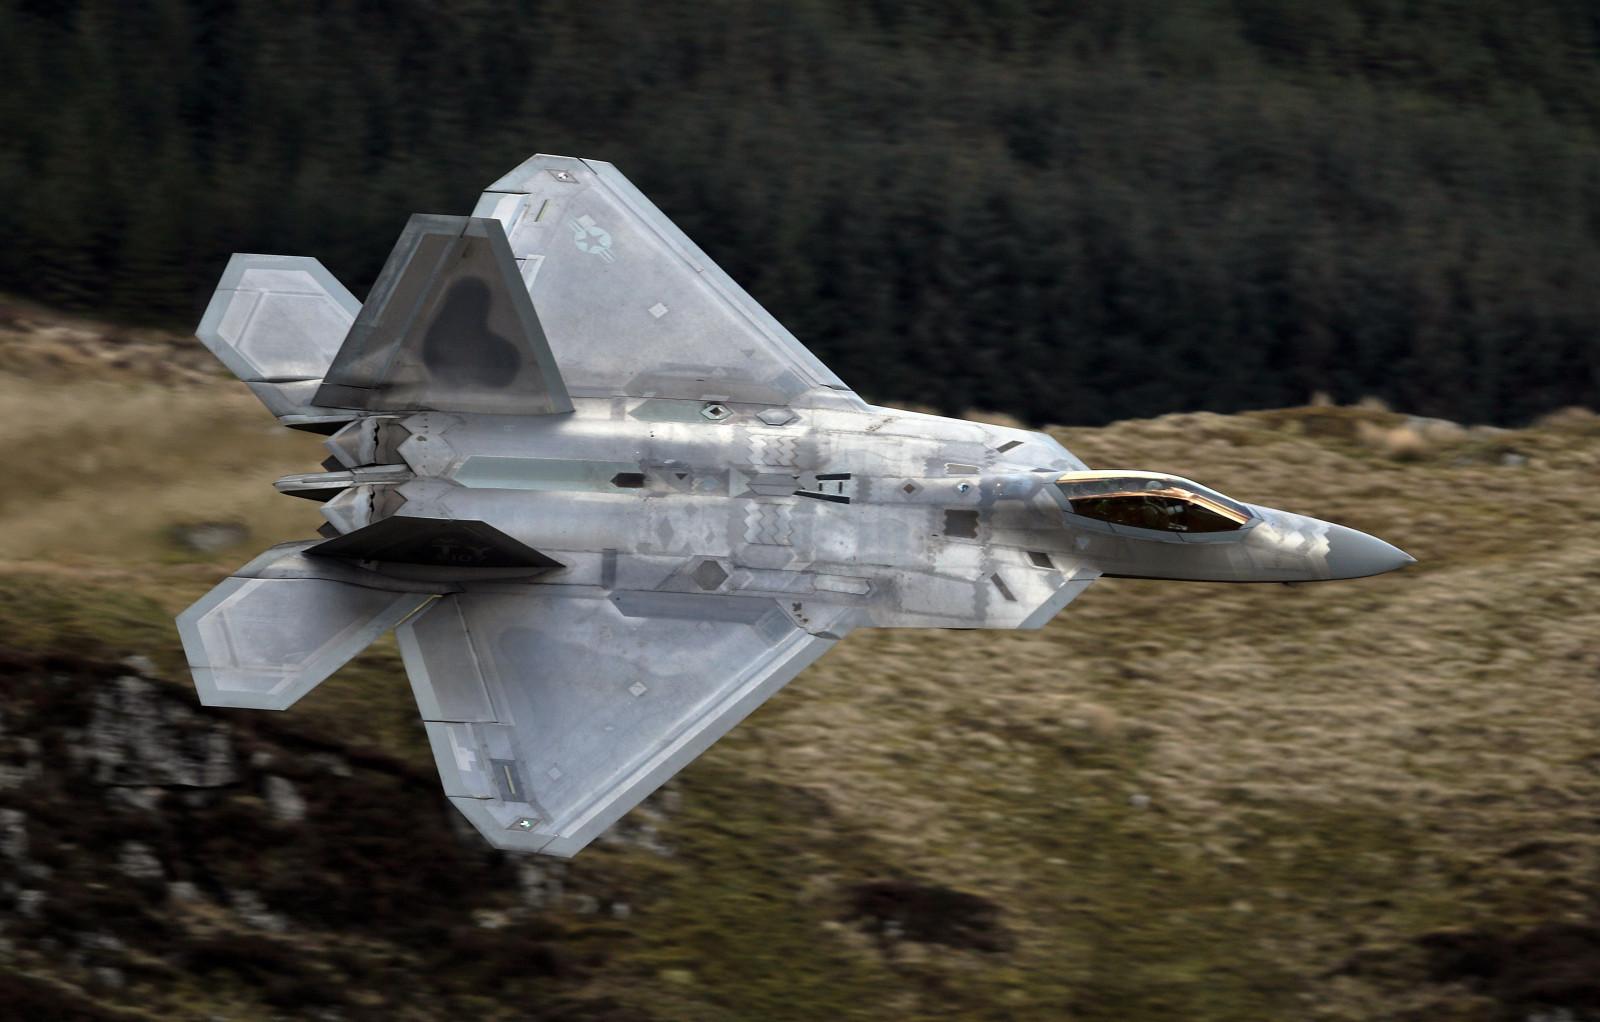 Wallpaper Lakenheath Wales Snowdonia Aviation Military